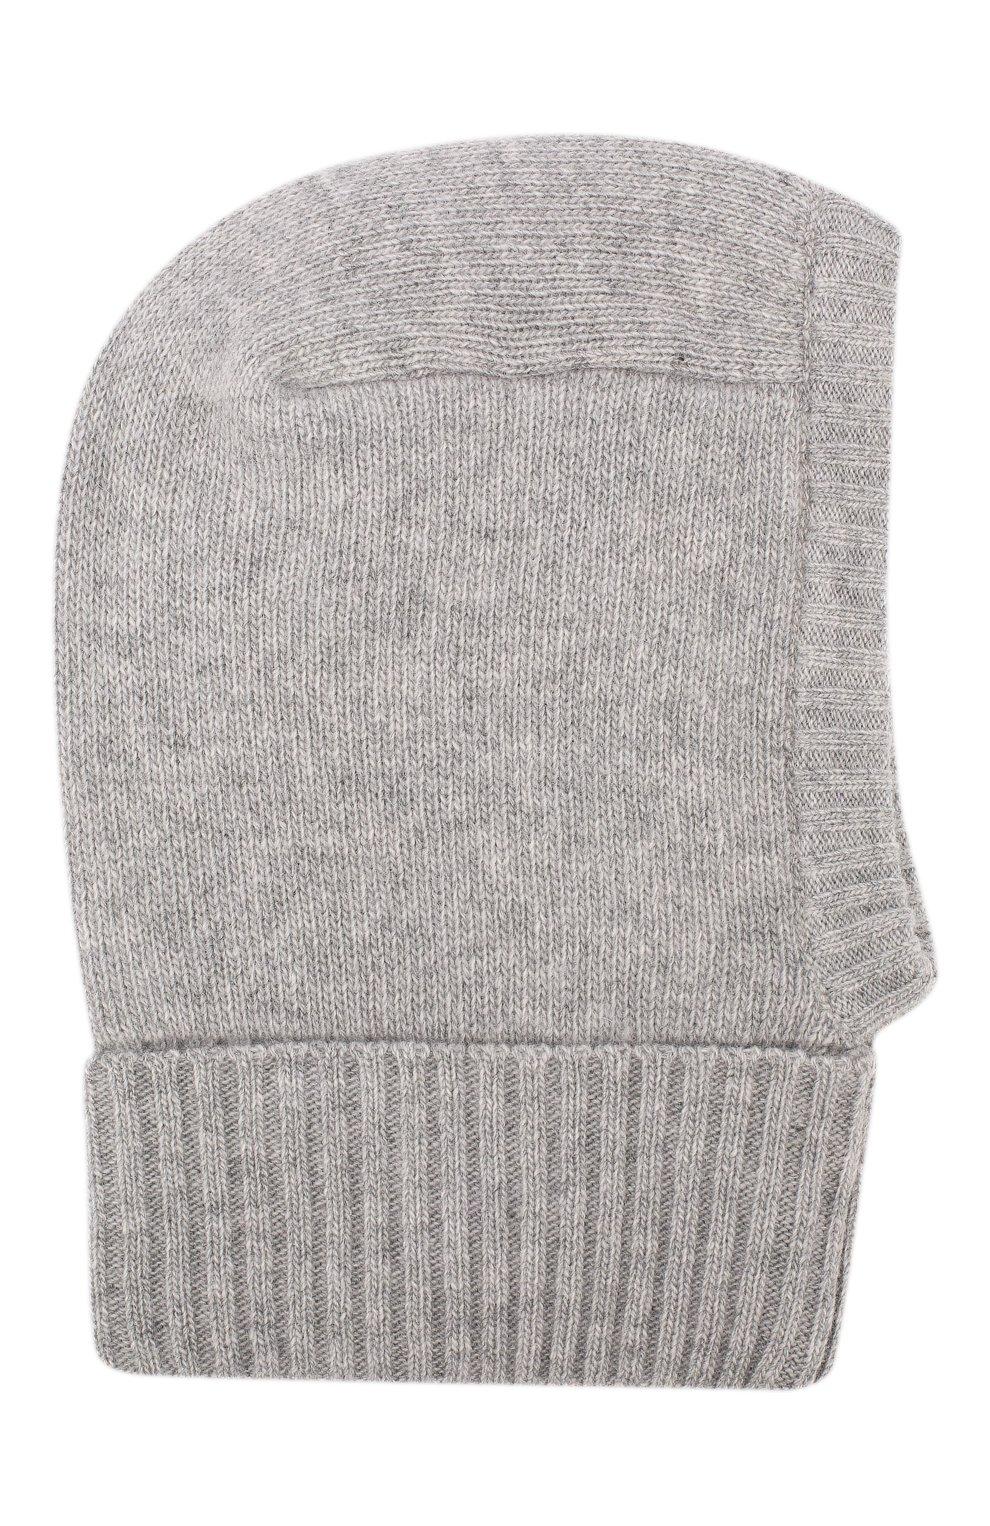 Детского шапка-балаклава из шерсти и кашемира IL TRENINO светло-серого цвета, арт. 18 7529/E2 | Фото 1